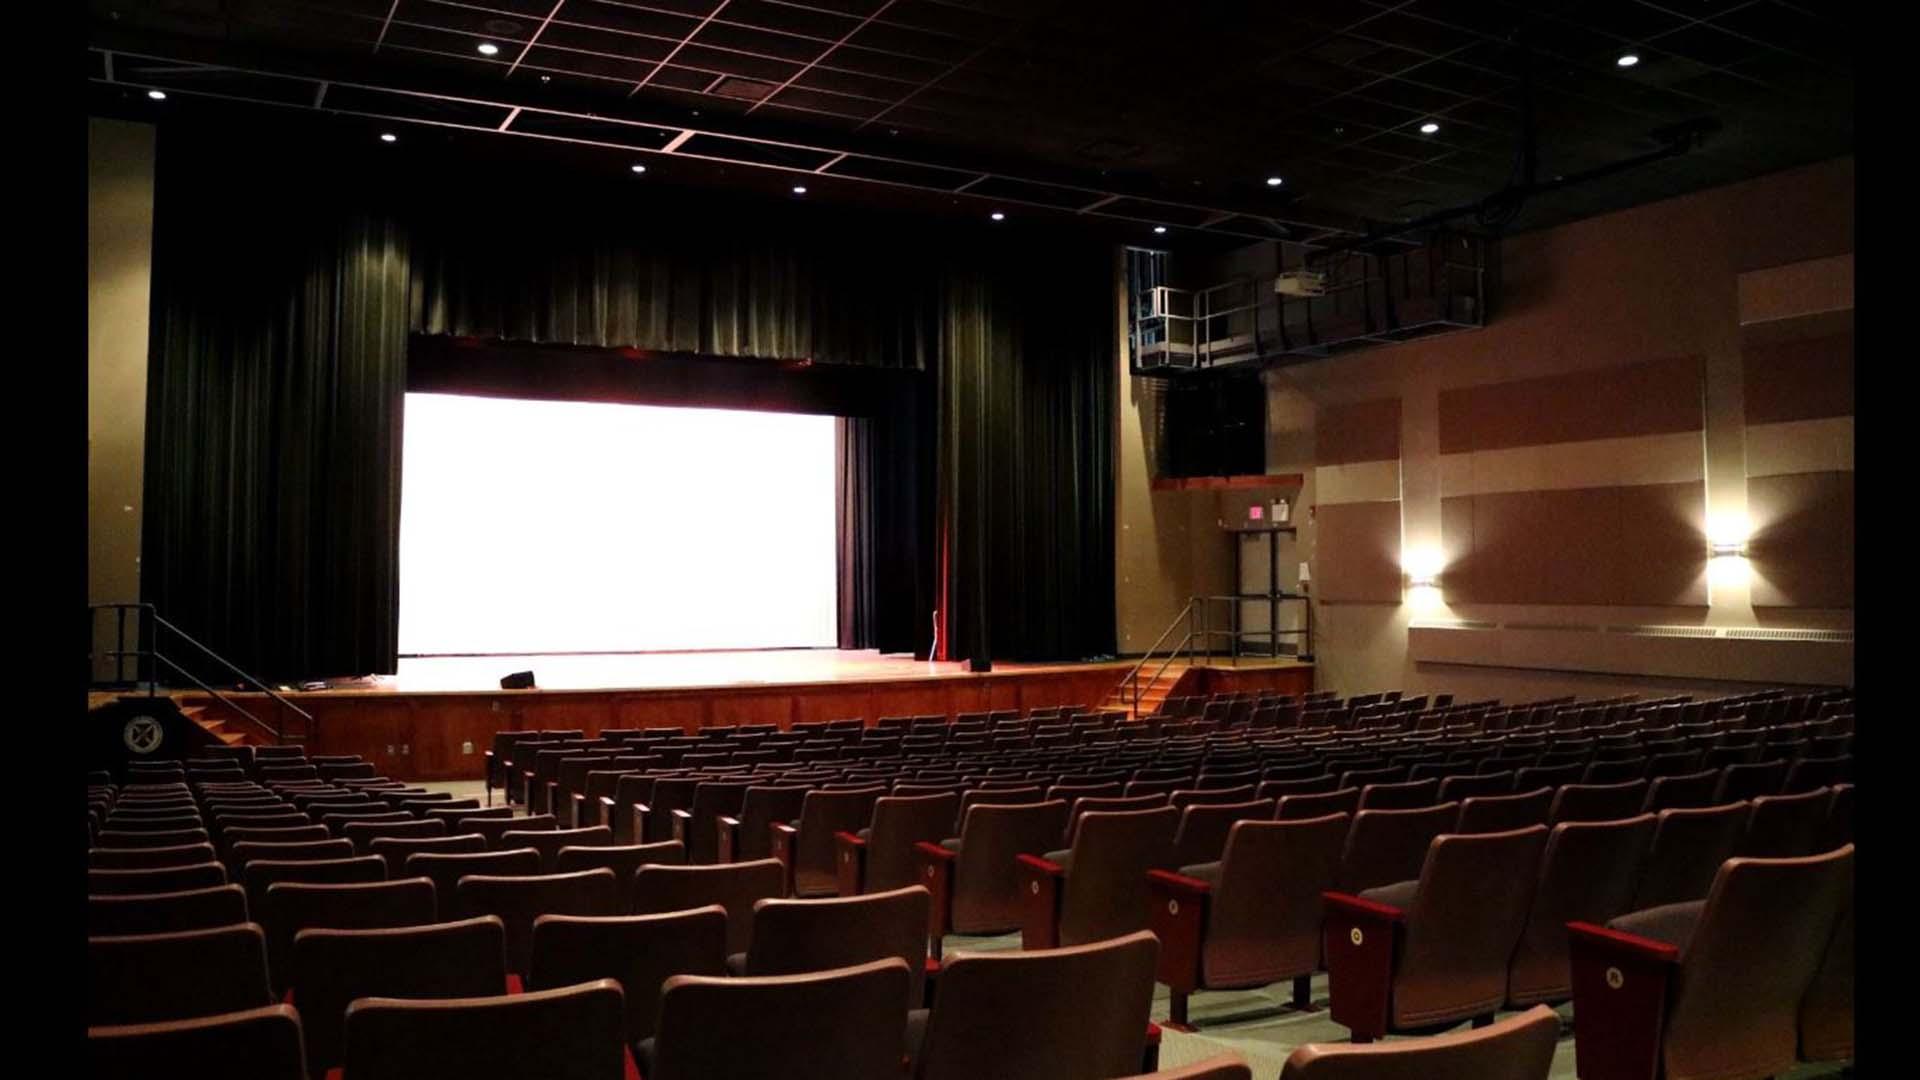 Strathspey Performing Arts Centre